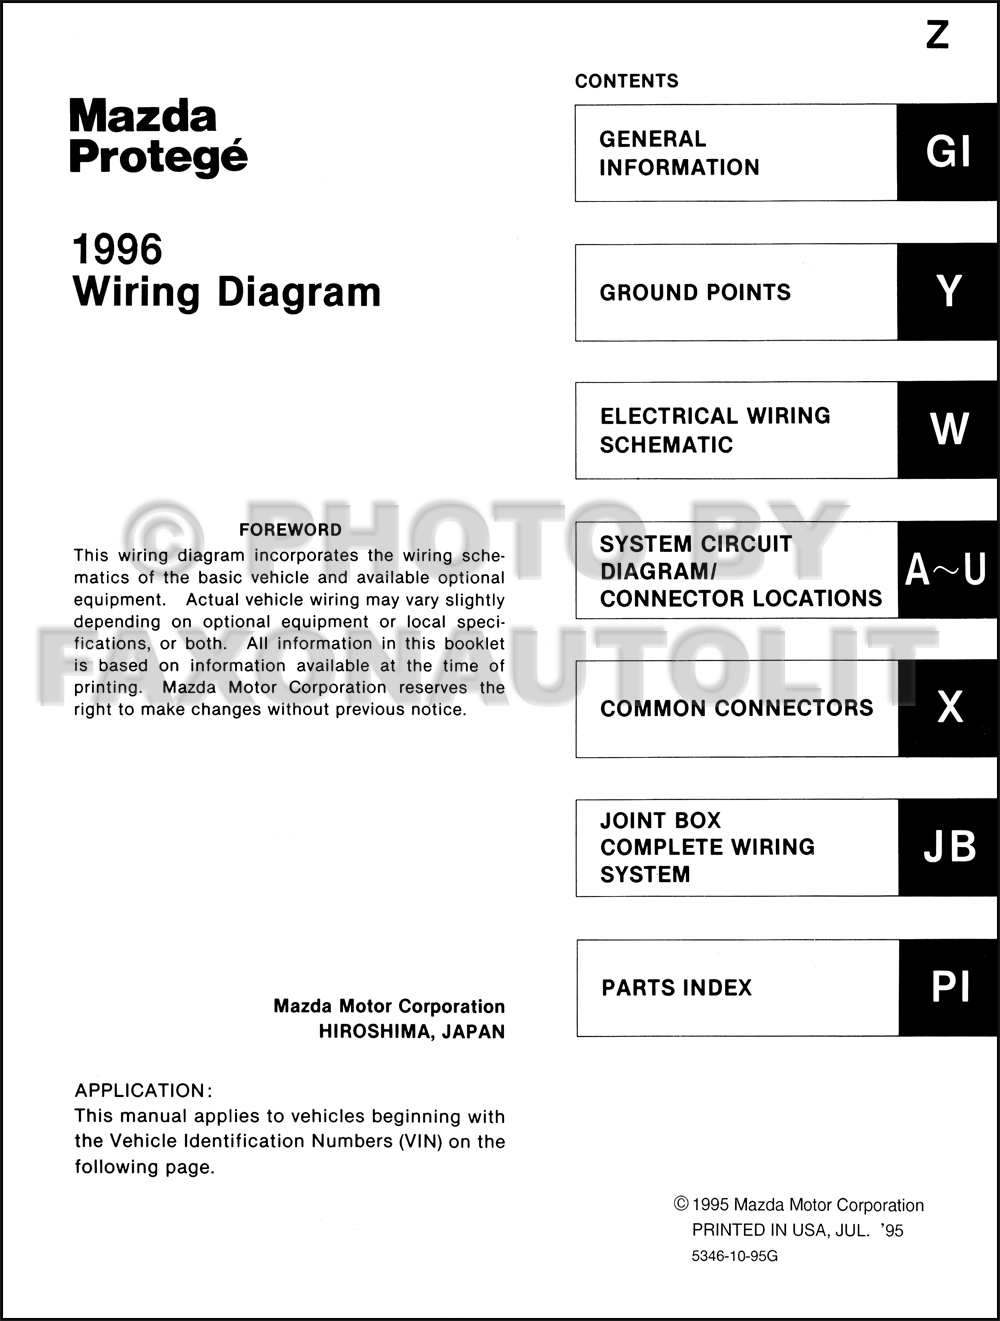 1999 mazda wiring diagram kc 7608  mazda wiring diagram schematic wiring  mazda wiring diagram schematic wiring